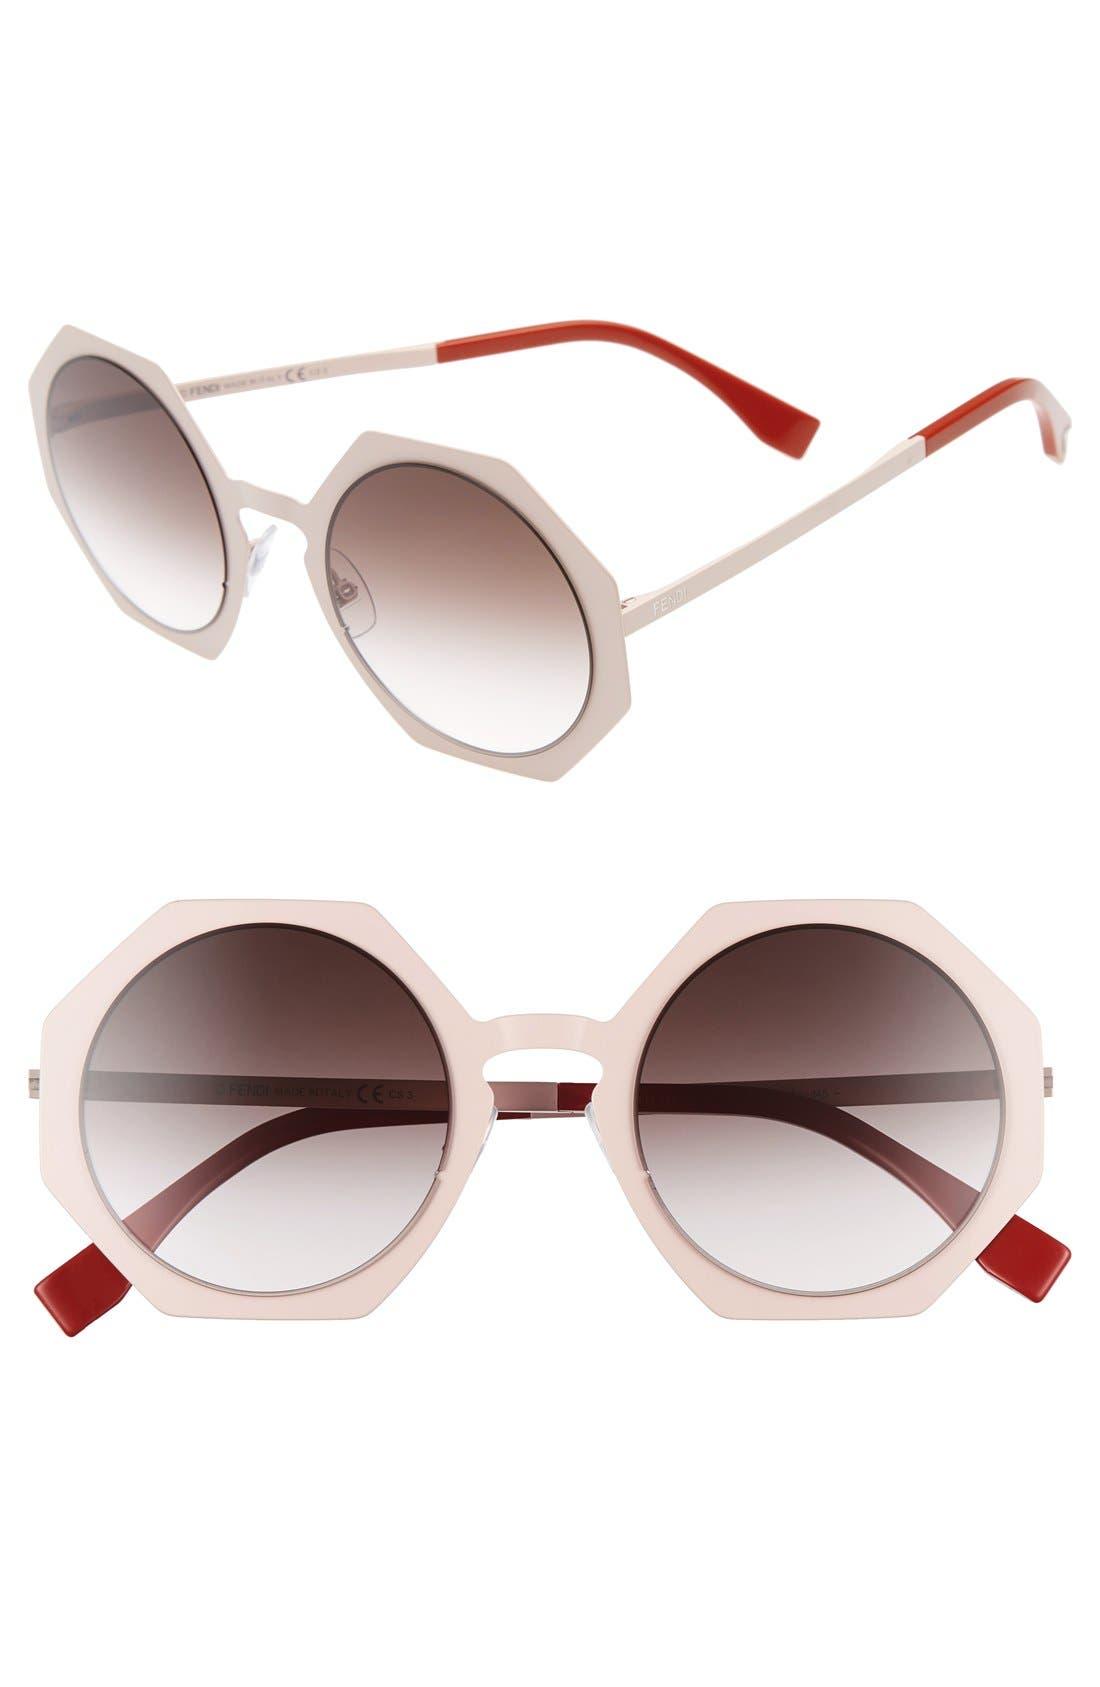 Alternate Image 1 Selected - Fendi 51mm Retro Octagon Sunglasses